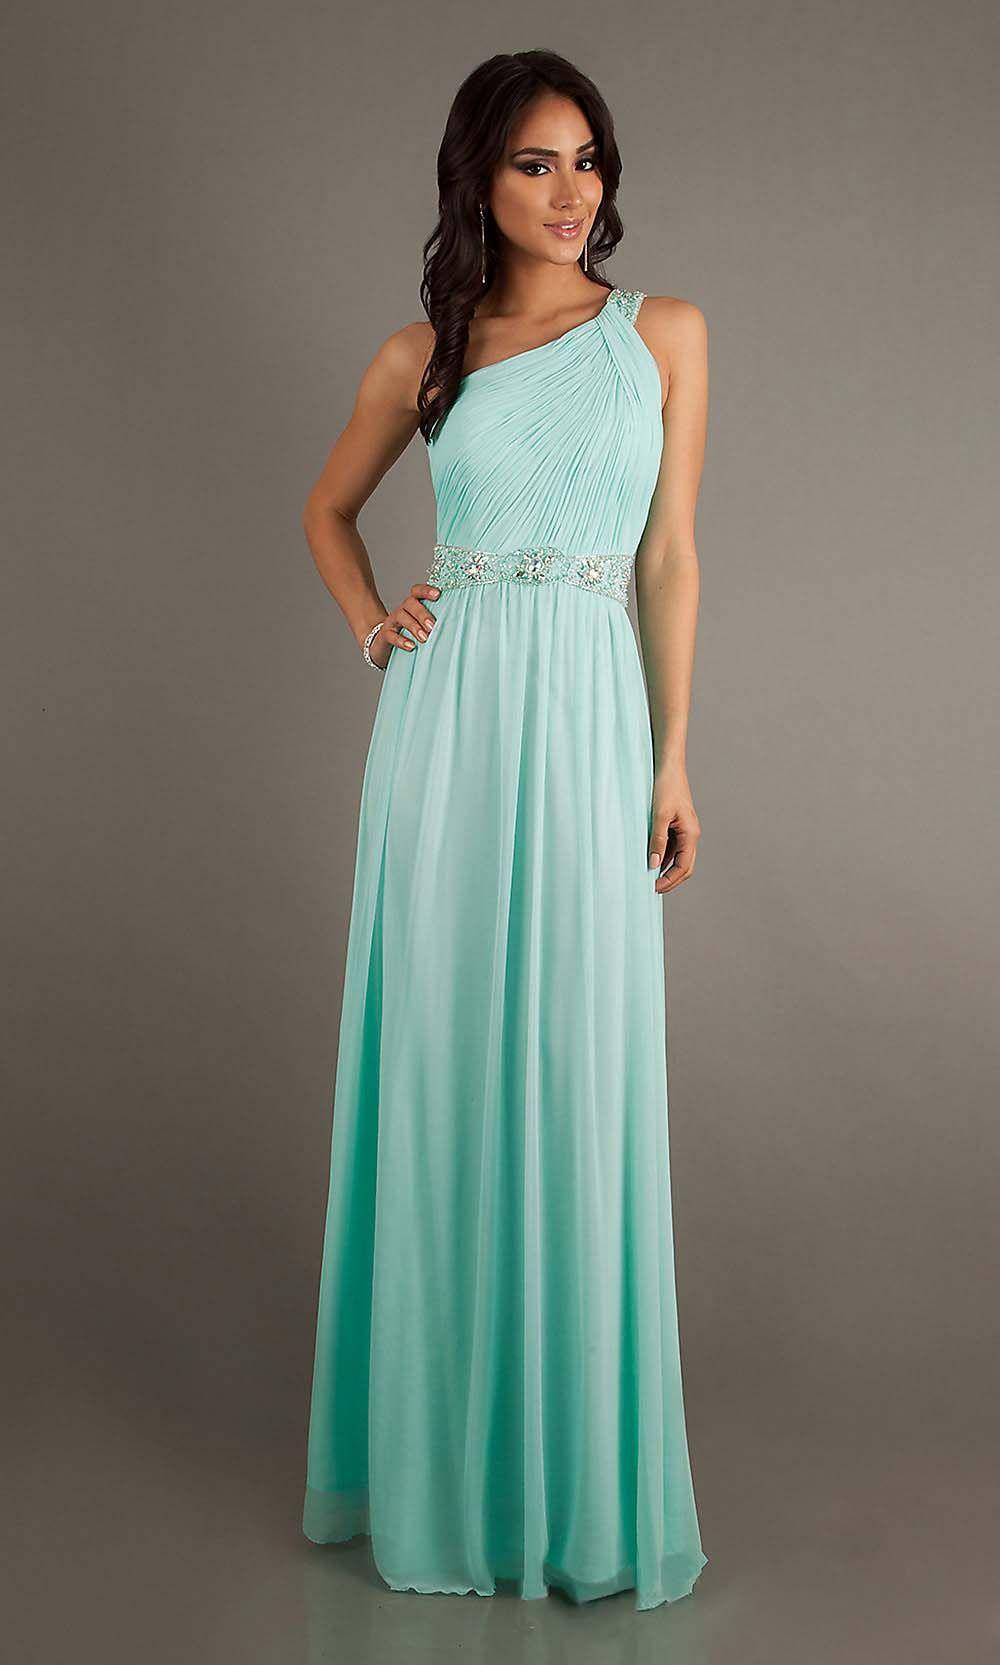 green prom dress, one shoulder prom dresses, chiffon prom dress ...